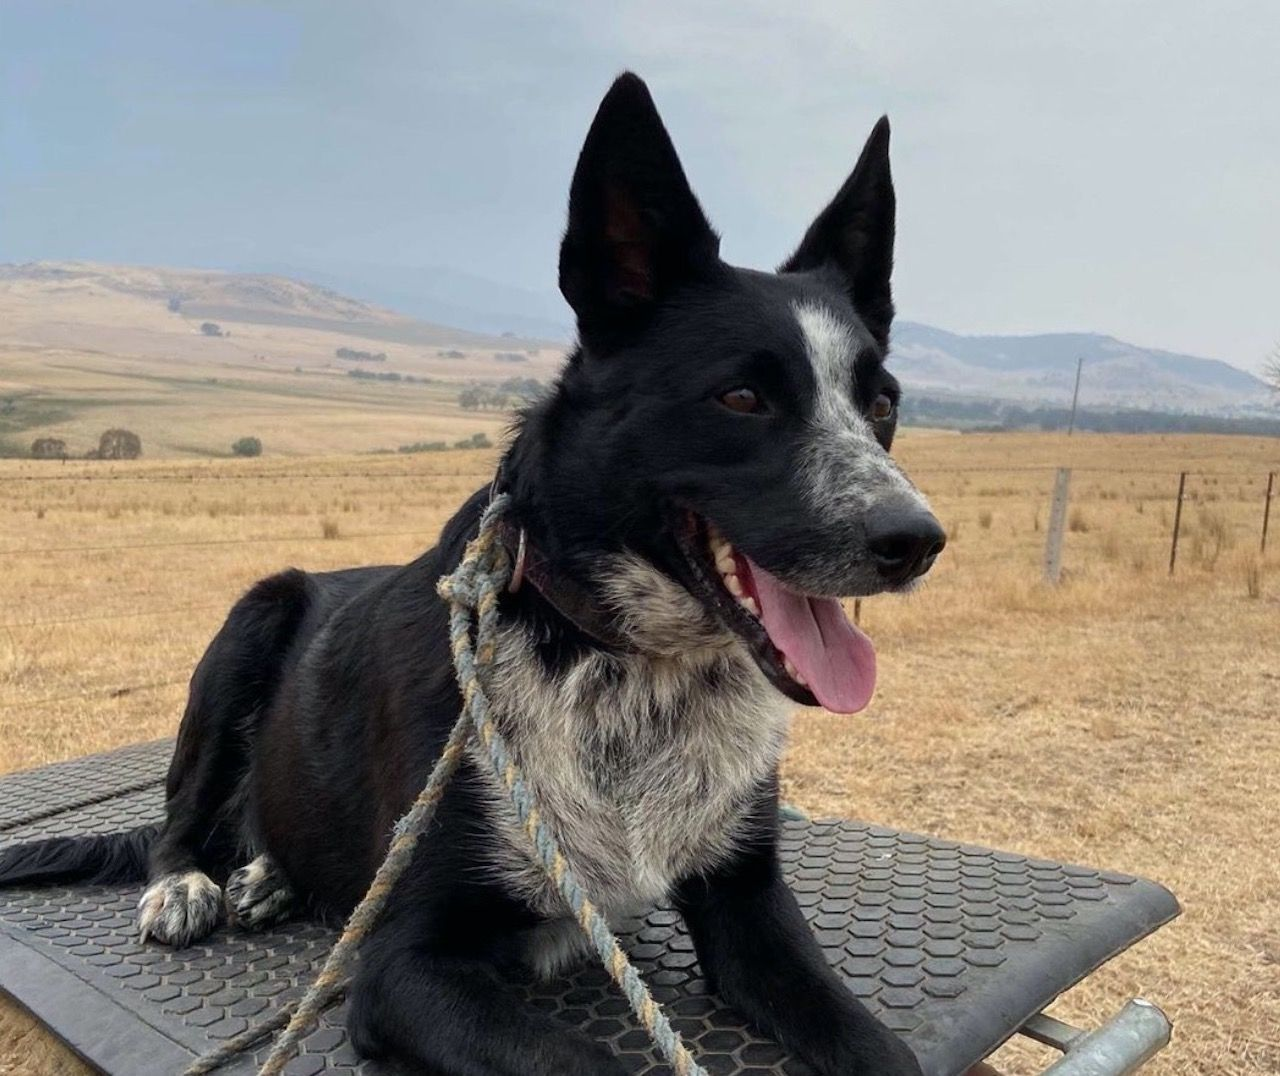 Dog saves sheep from Australian fire